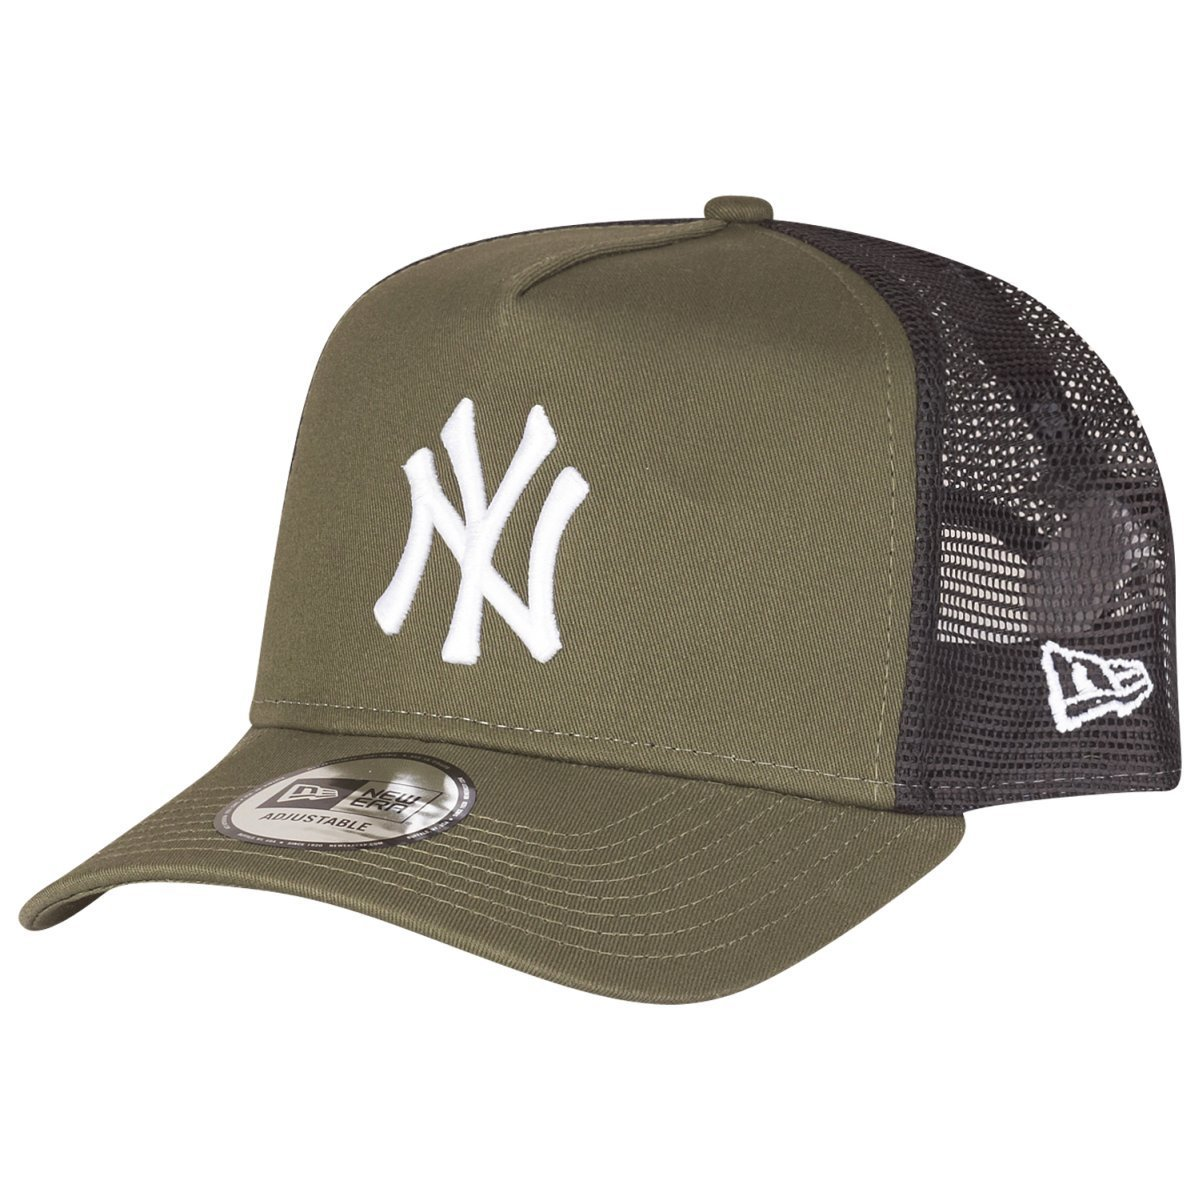 A NEW ERA Gorra Trucker League Essential York Yankees Oliva Hombre Verde (Med) Talla Única 80635928